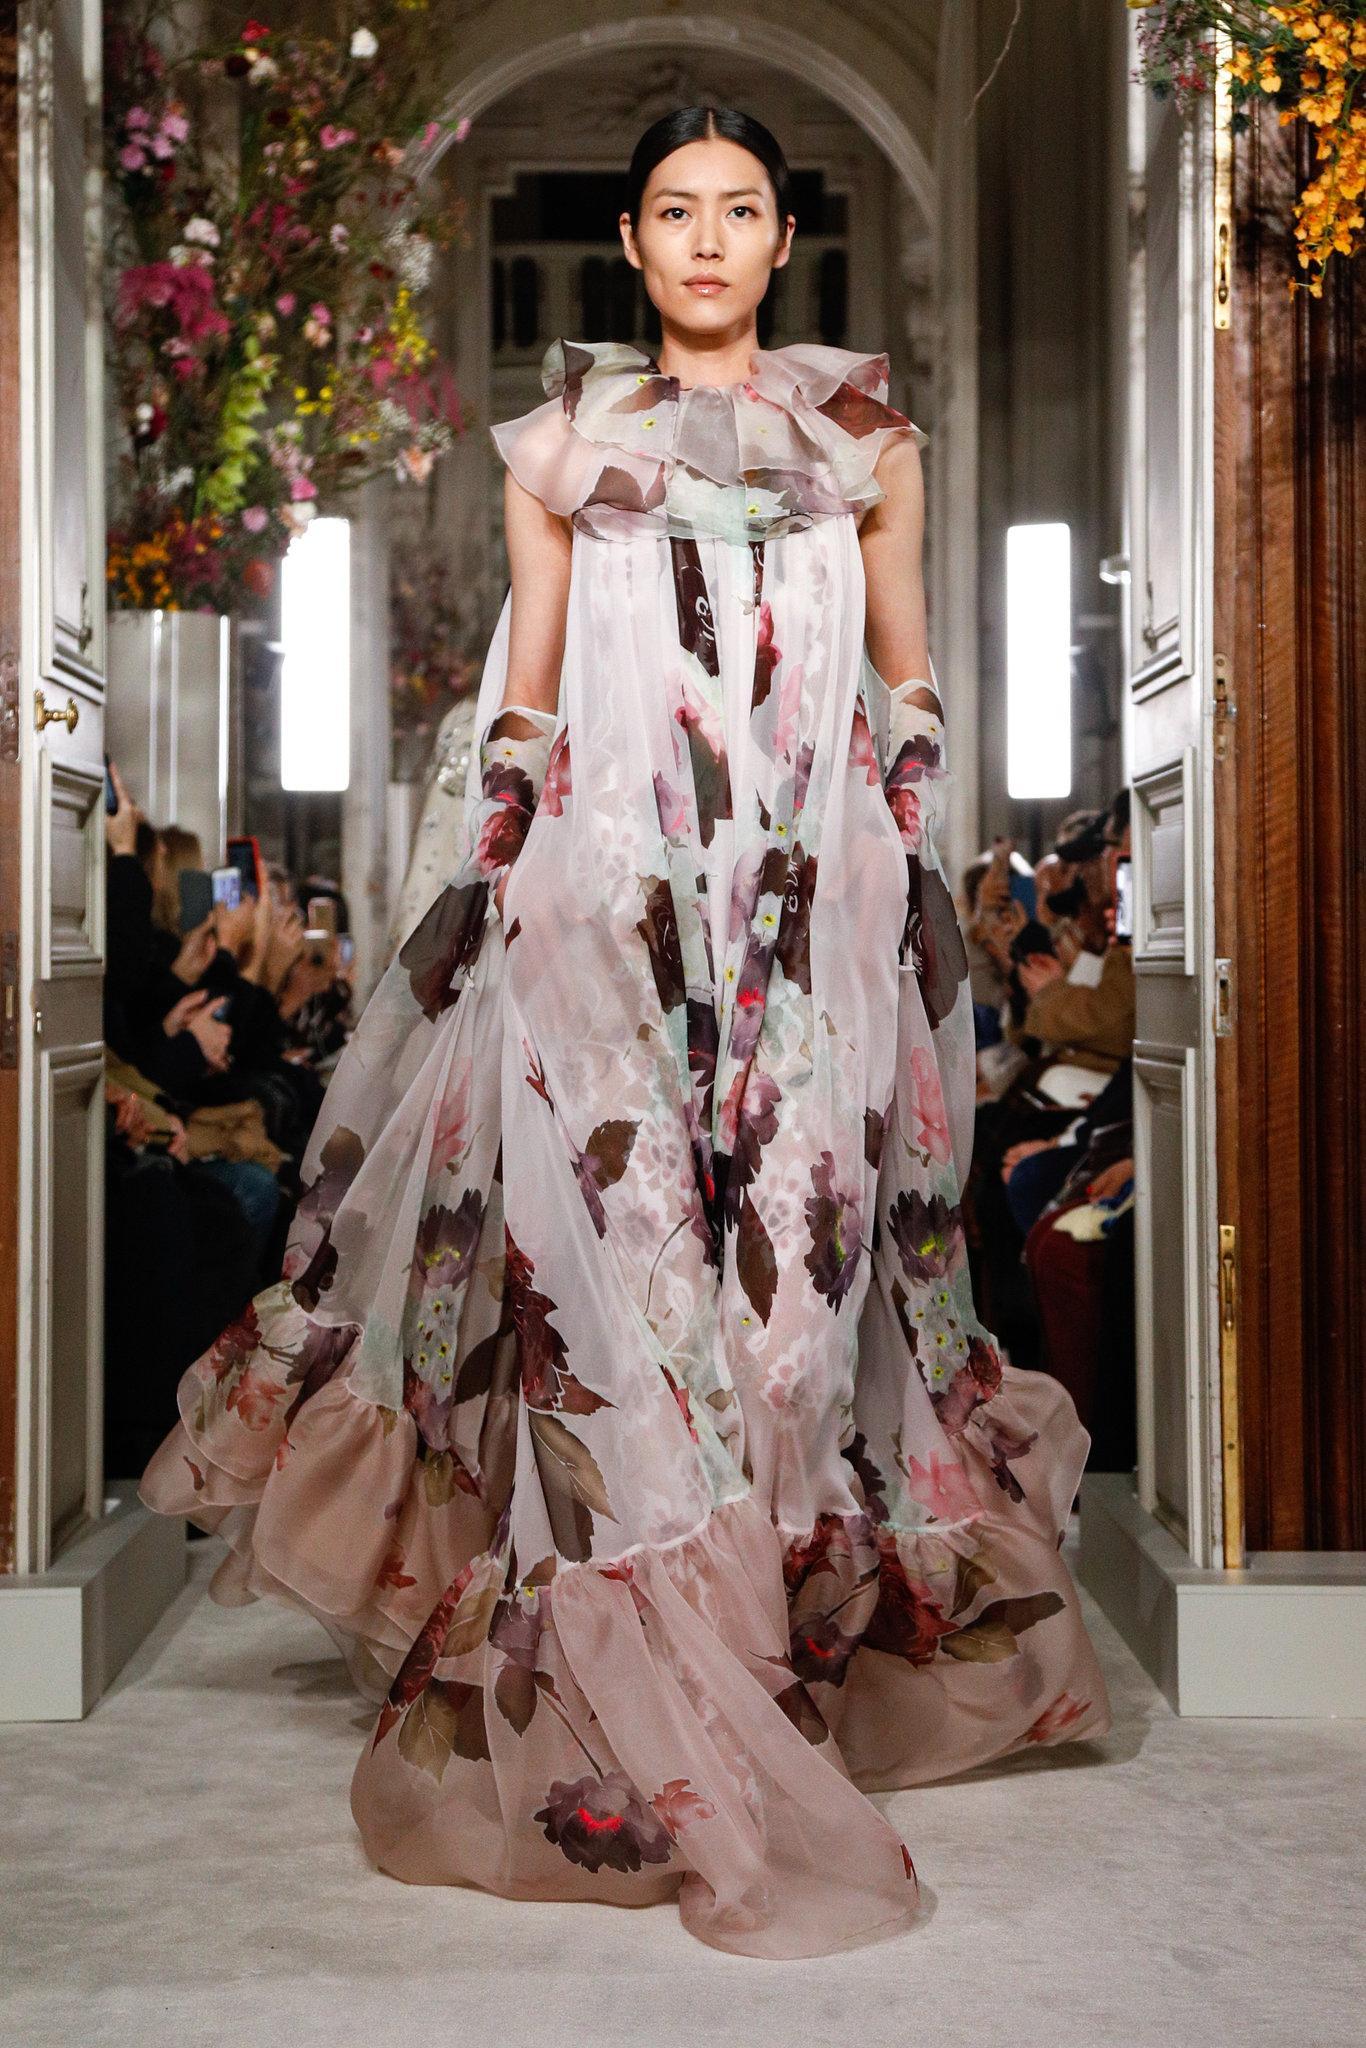 Valen-spring-2019-couture-slide-A6IK-superJumbo.jpg